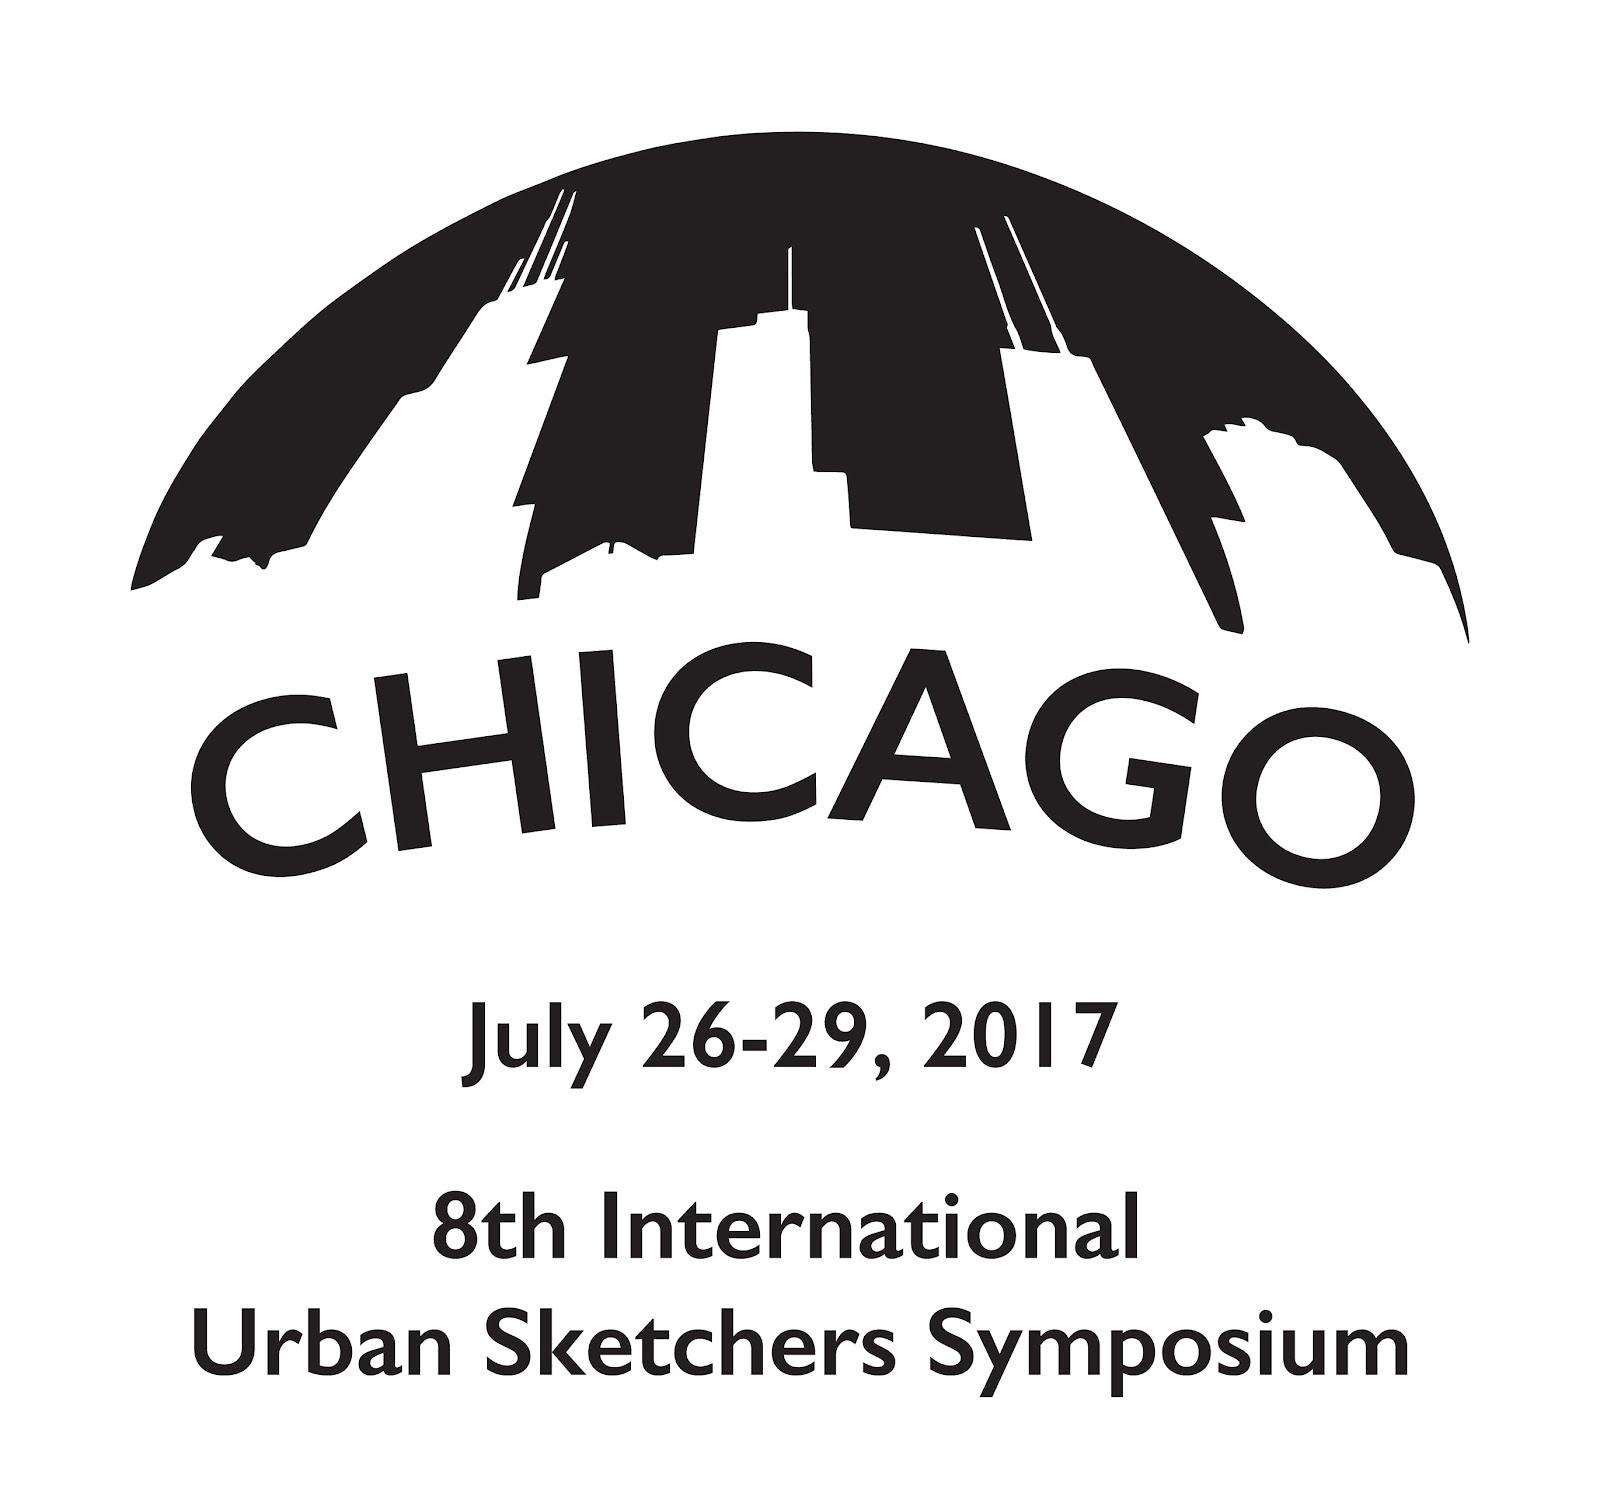 Chicago2017_FINAL.jpg